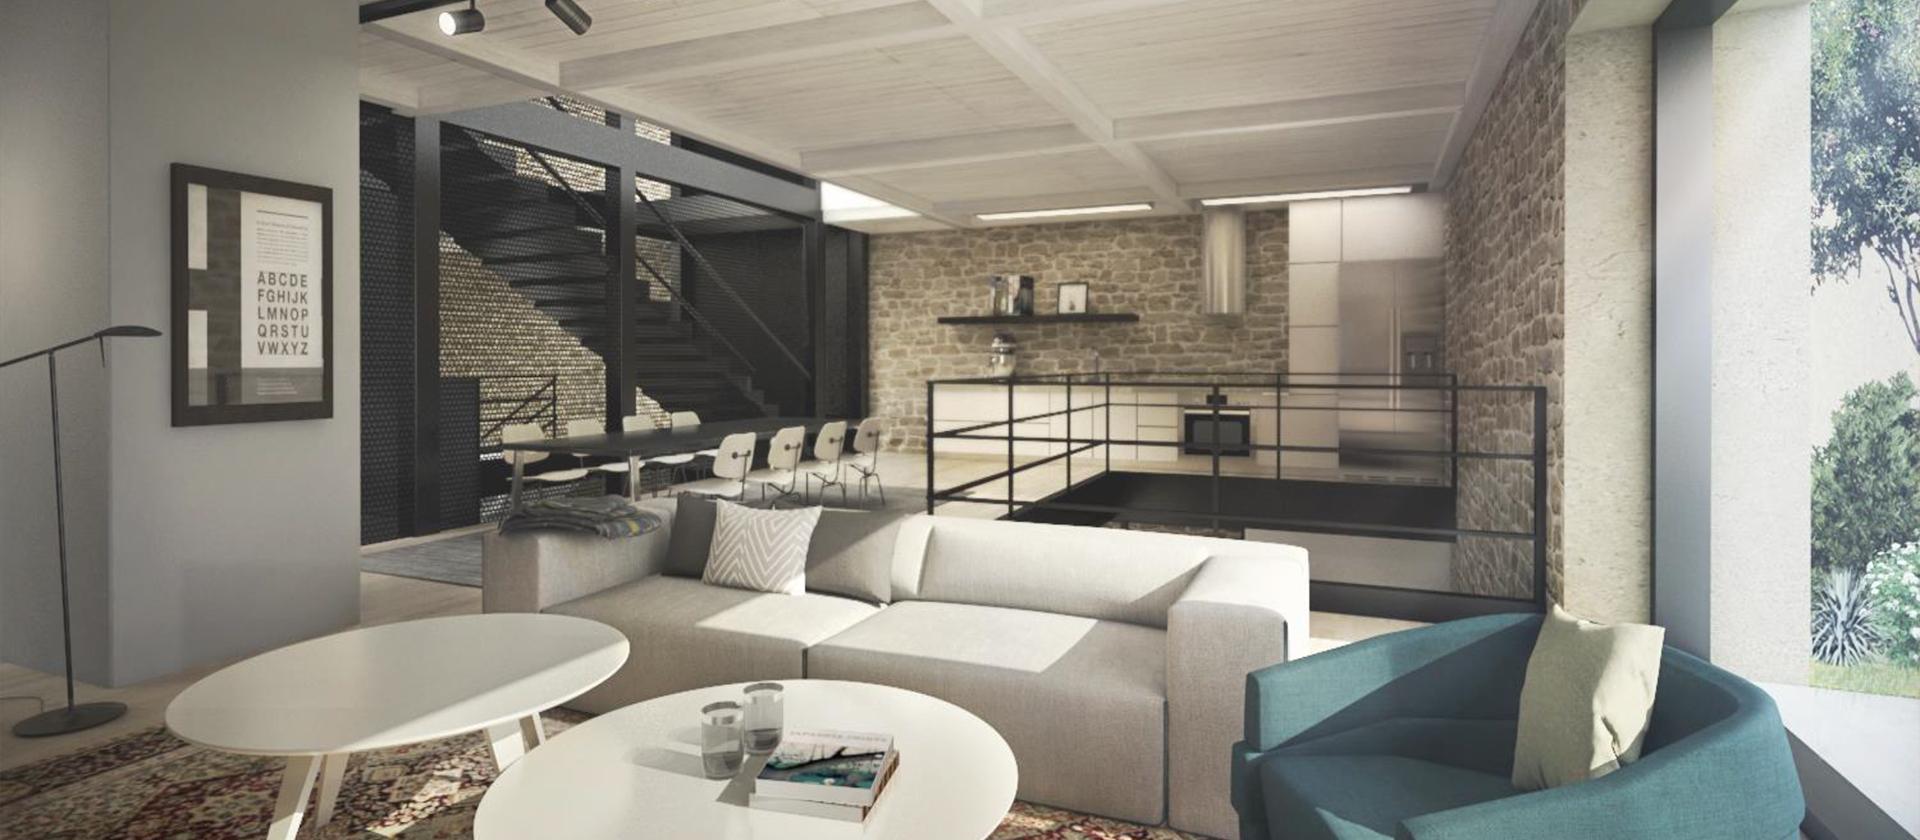 FIDI, Italy - Interior Design School in Florence - Design School ...